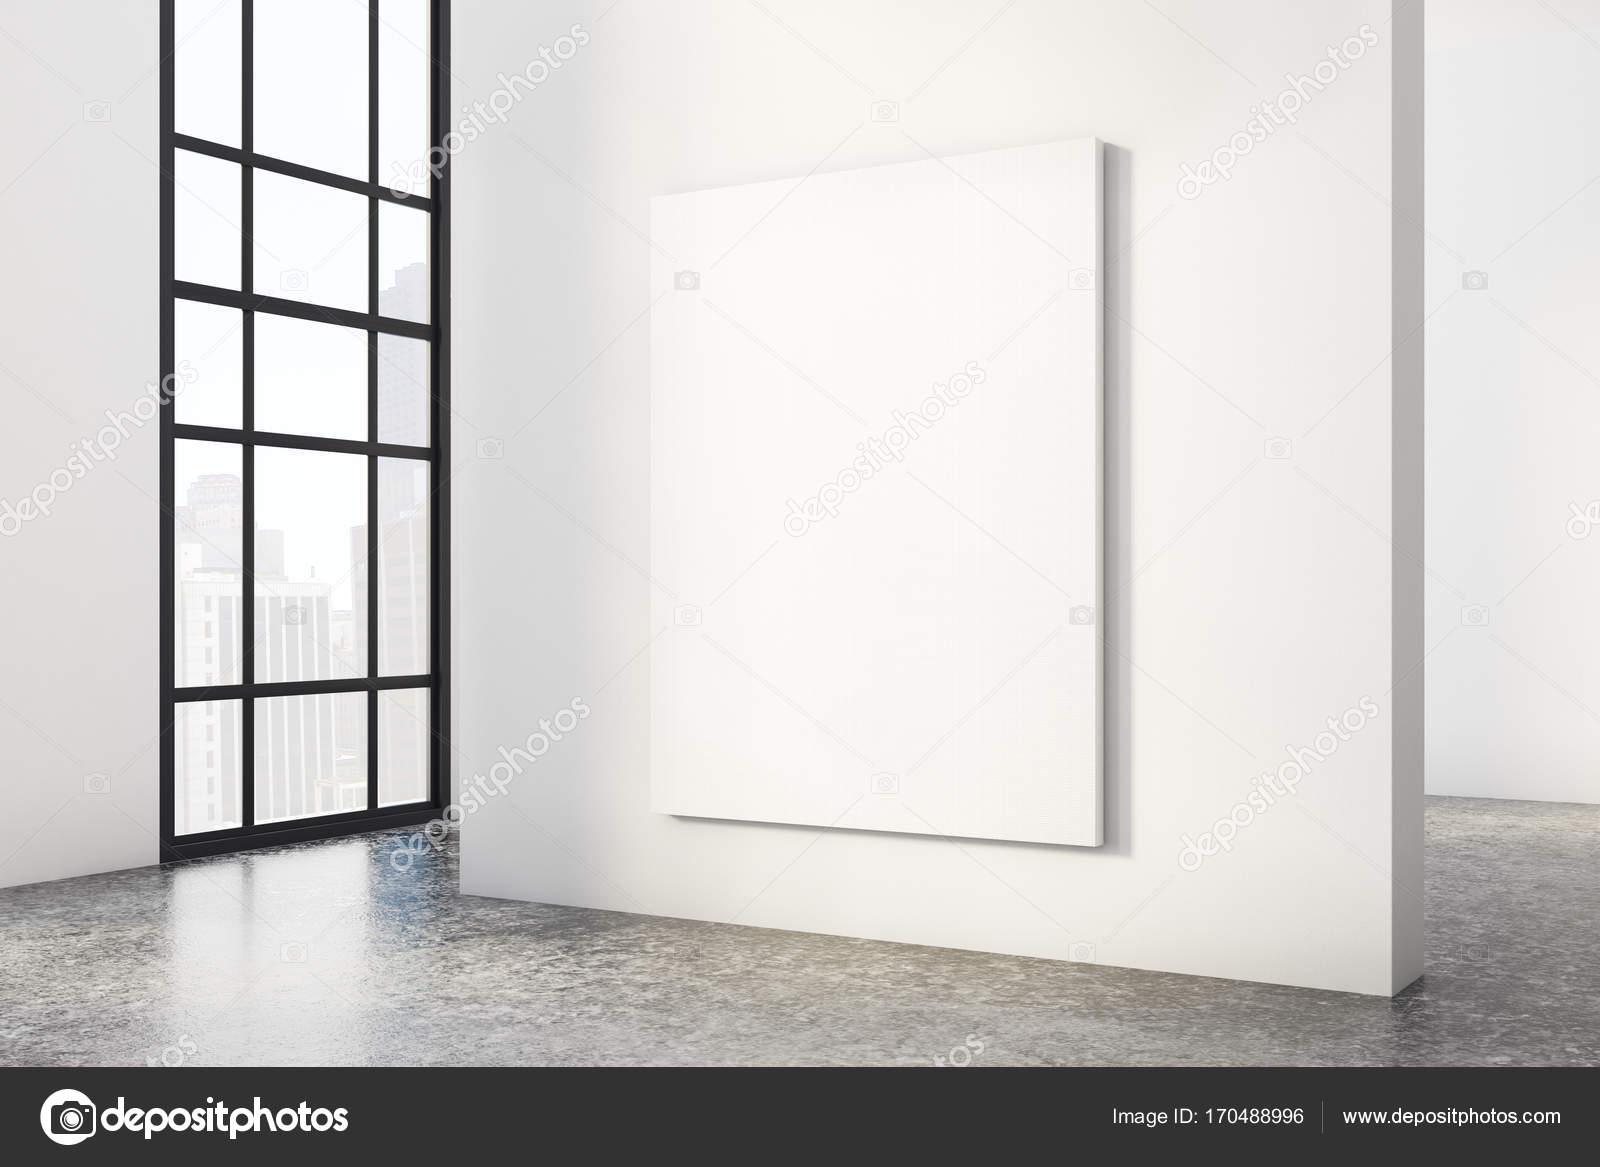 Moderne beton interieur mit poster u stockfoto peshkova